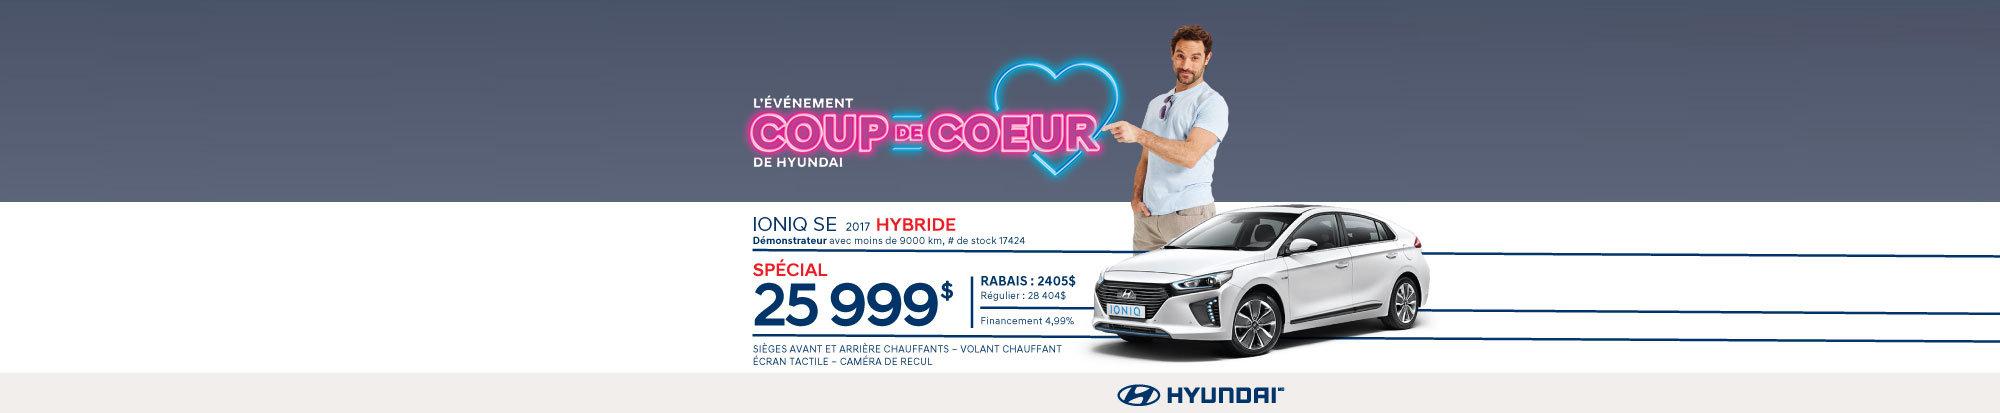 HYUNDAI Ioniq SE Hybride 2017 démo web